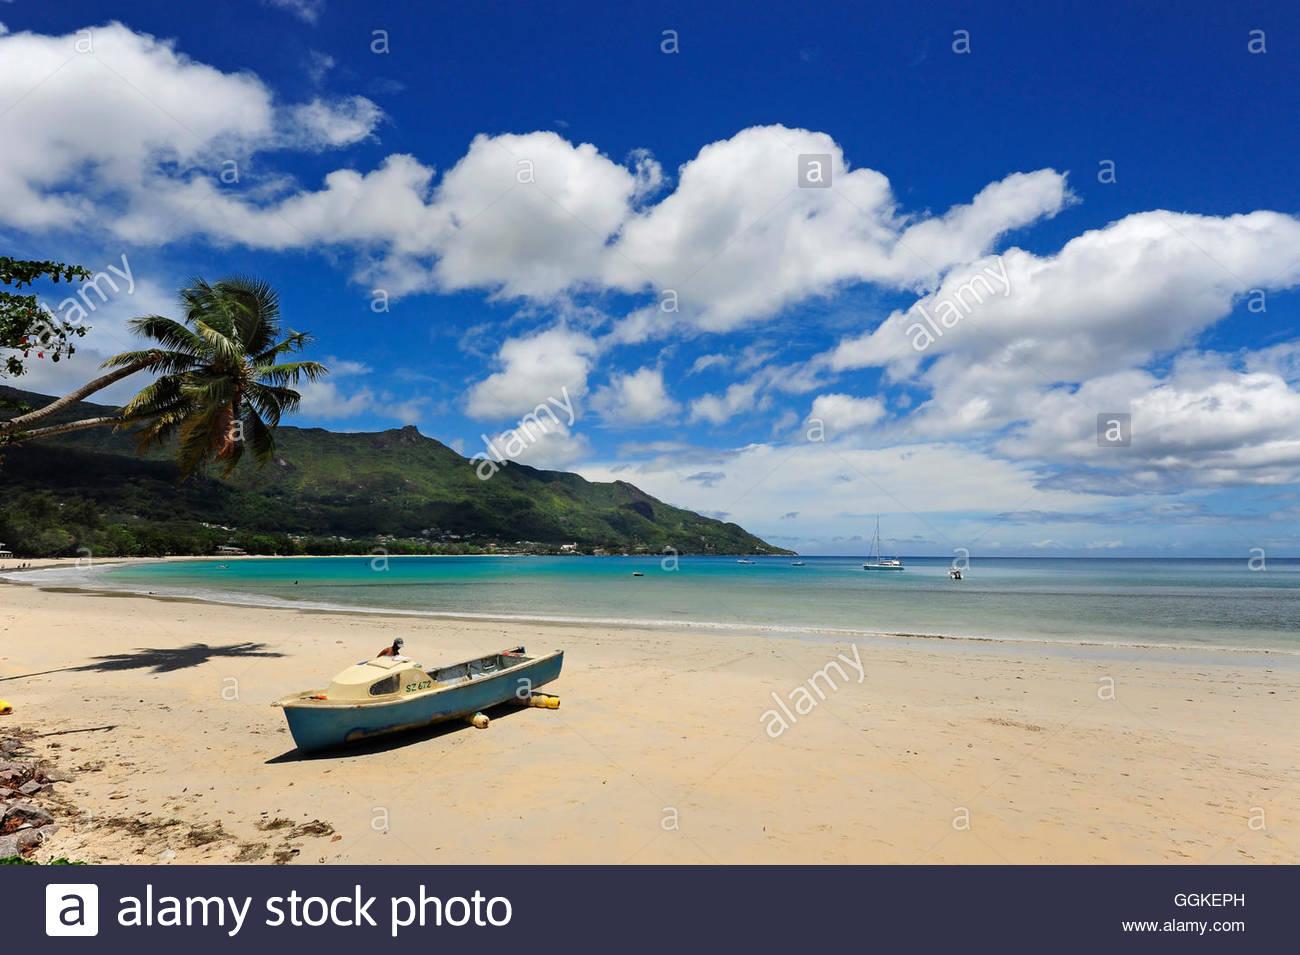 Boat on the beach, Beau Vallon, Mahe Island, the Seychelles, Indian Ocean - Stock Image